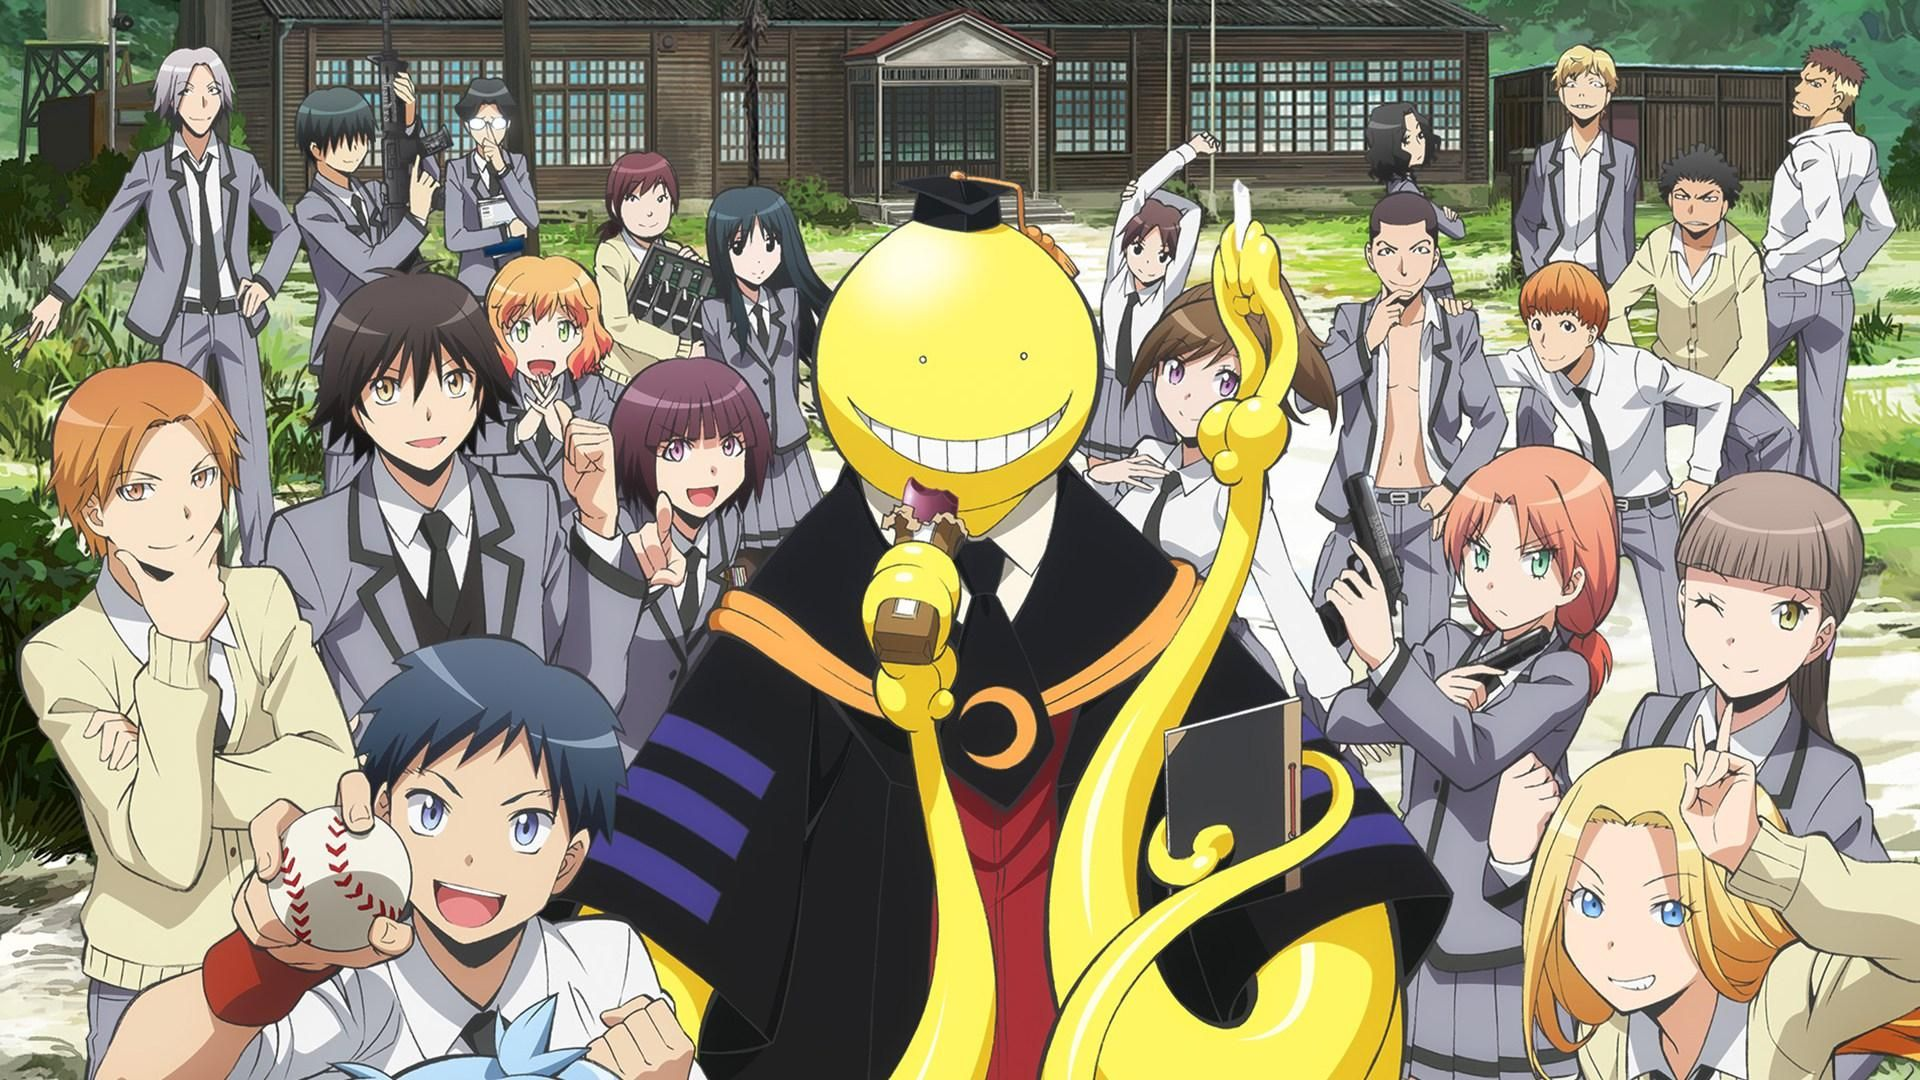 77 Assassination Classroom Aesthetic Background Anime Classroom Assassination Classroom Anime Wallpaper